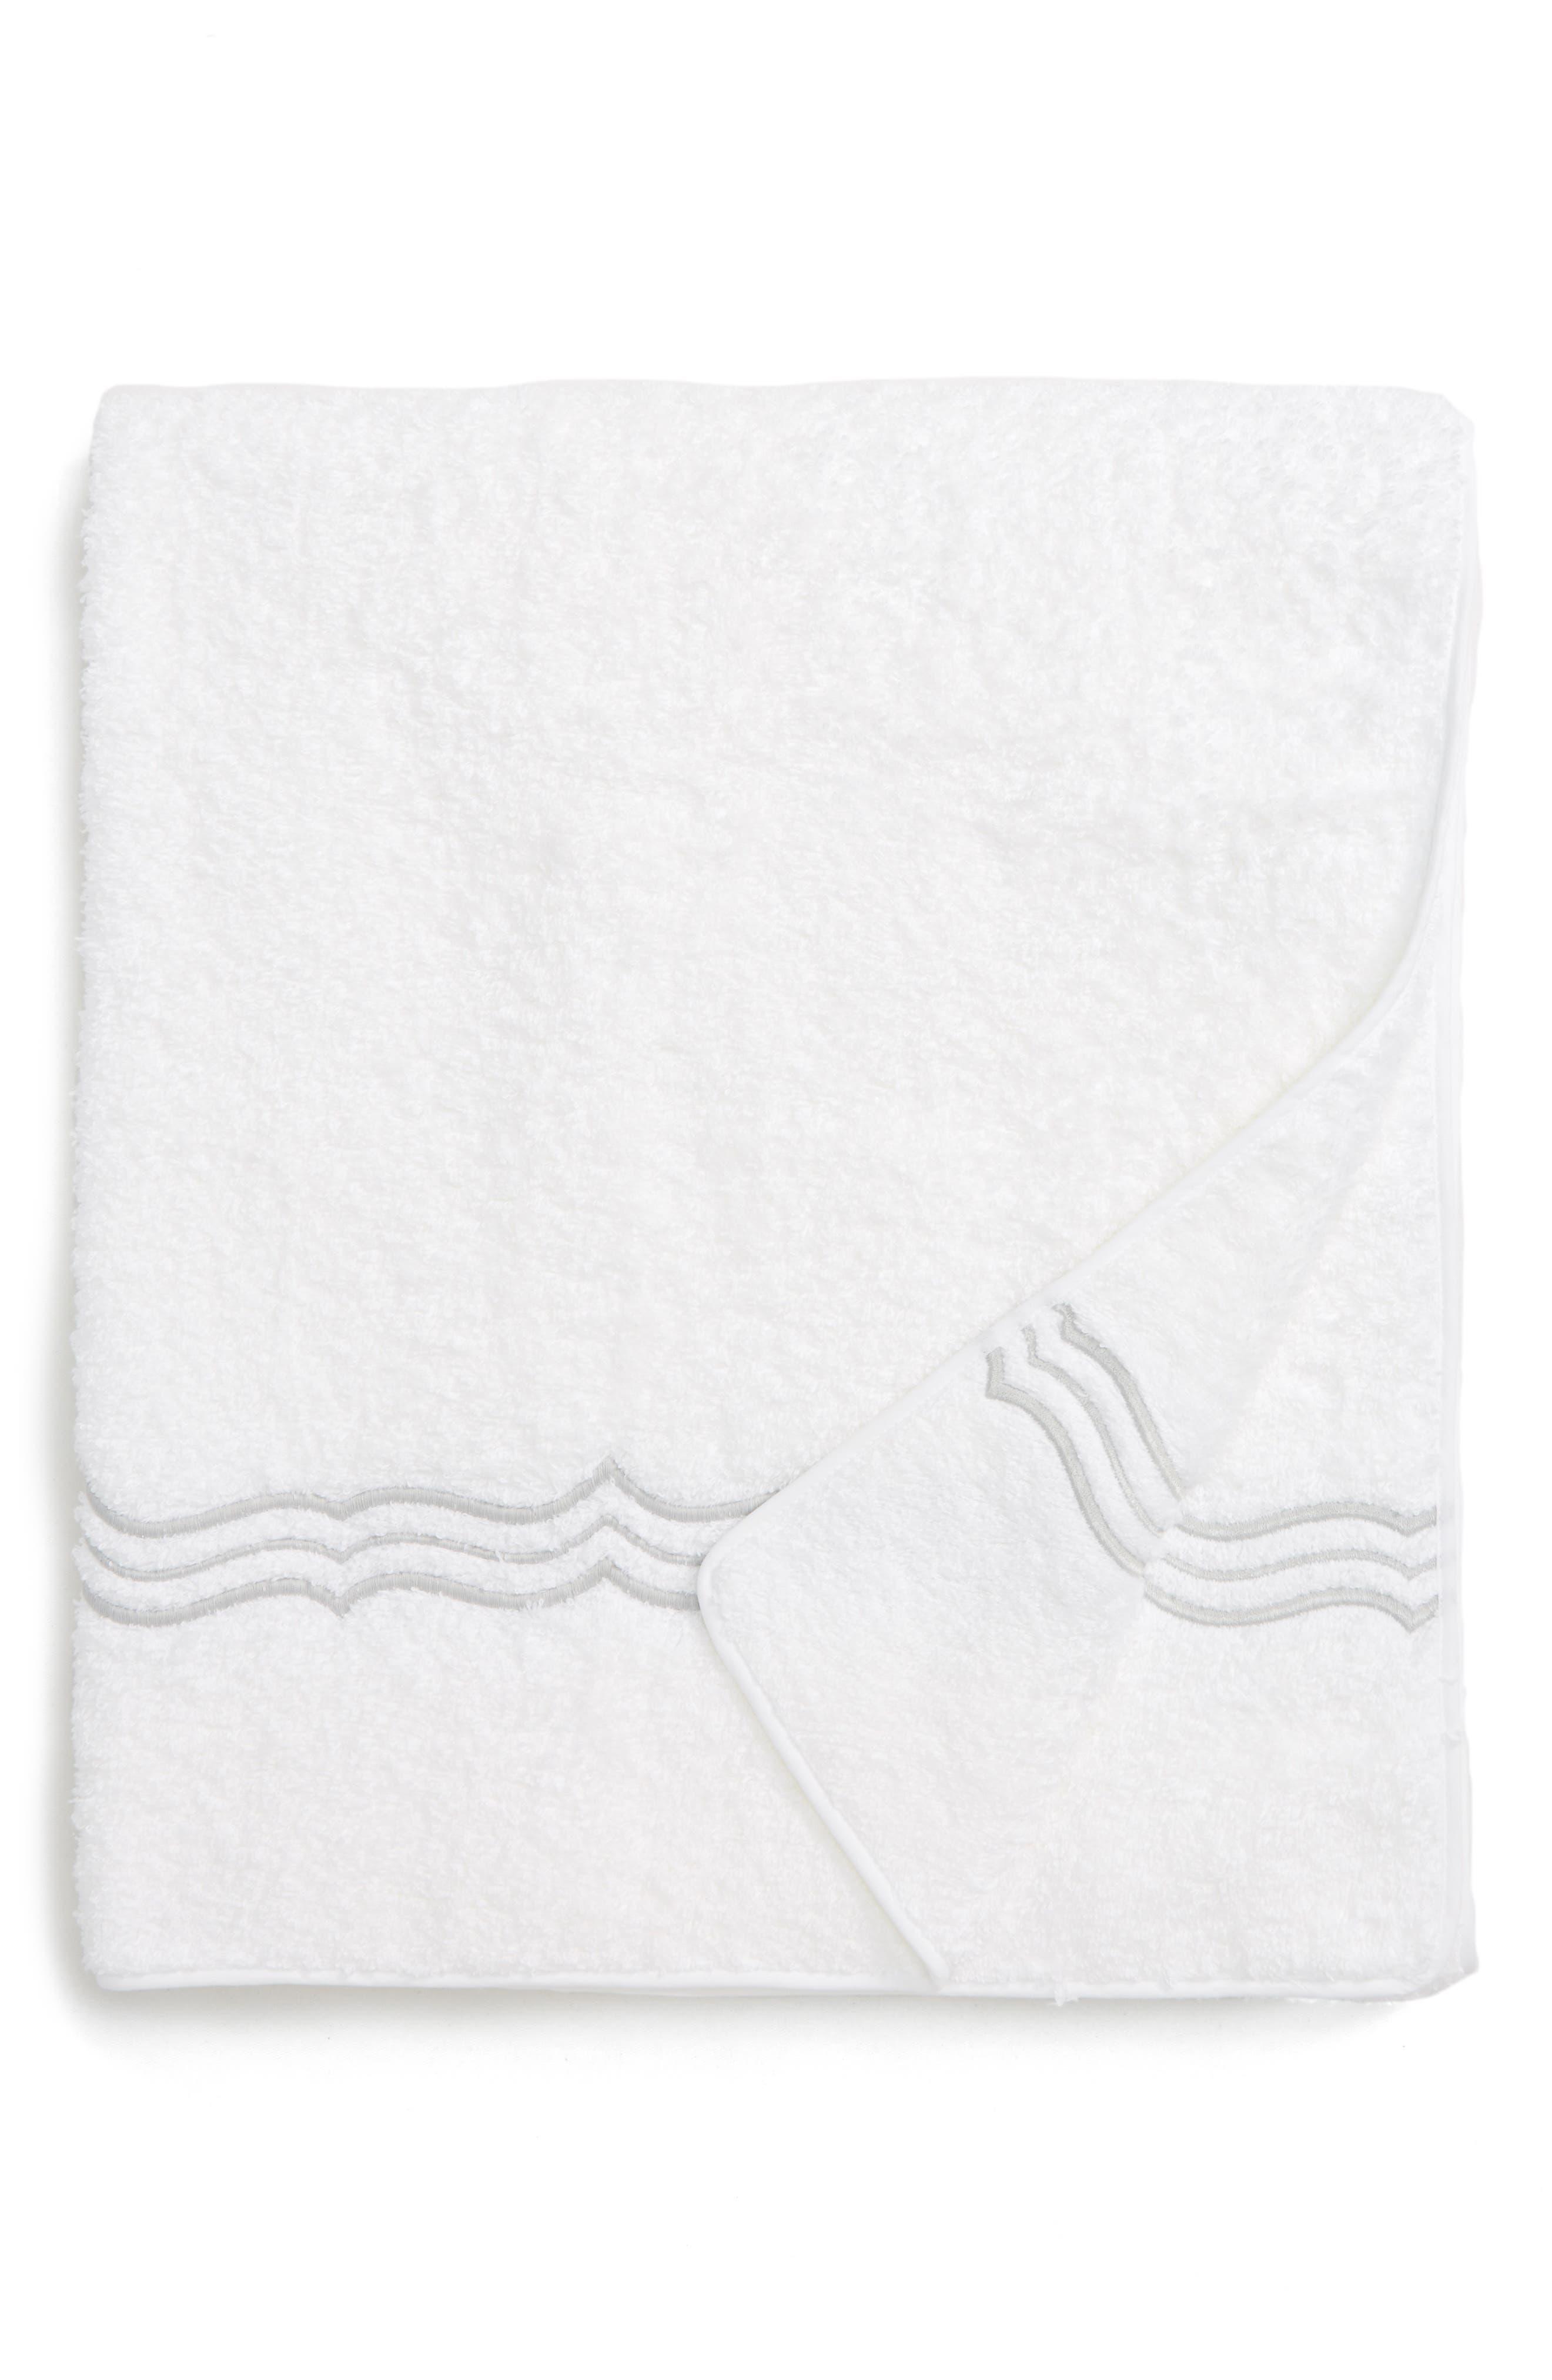 Main Image - Matouk Paola Bath Towel